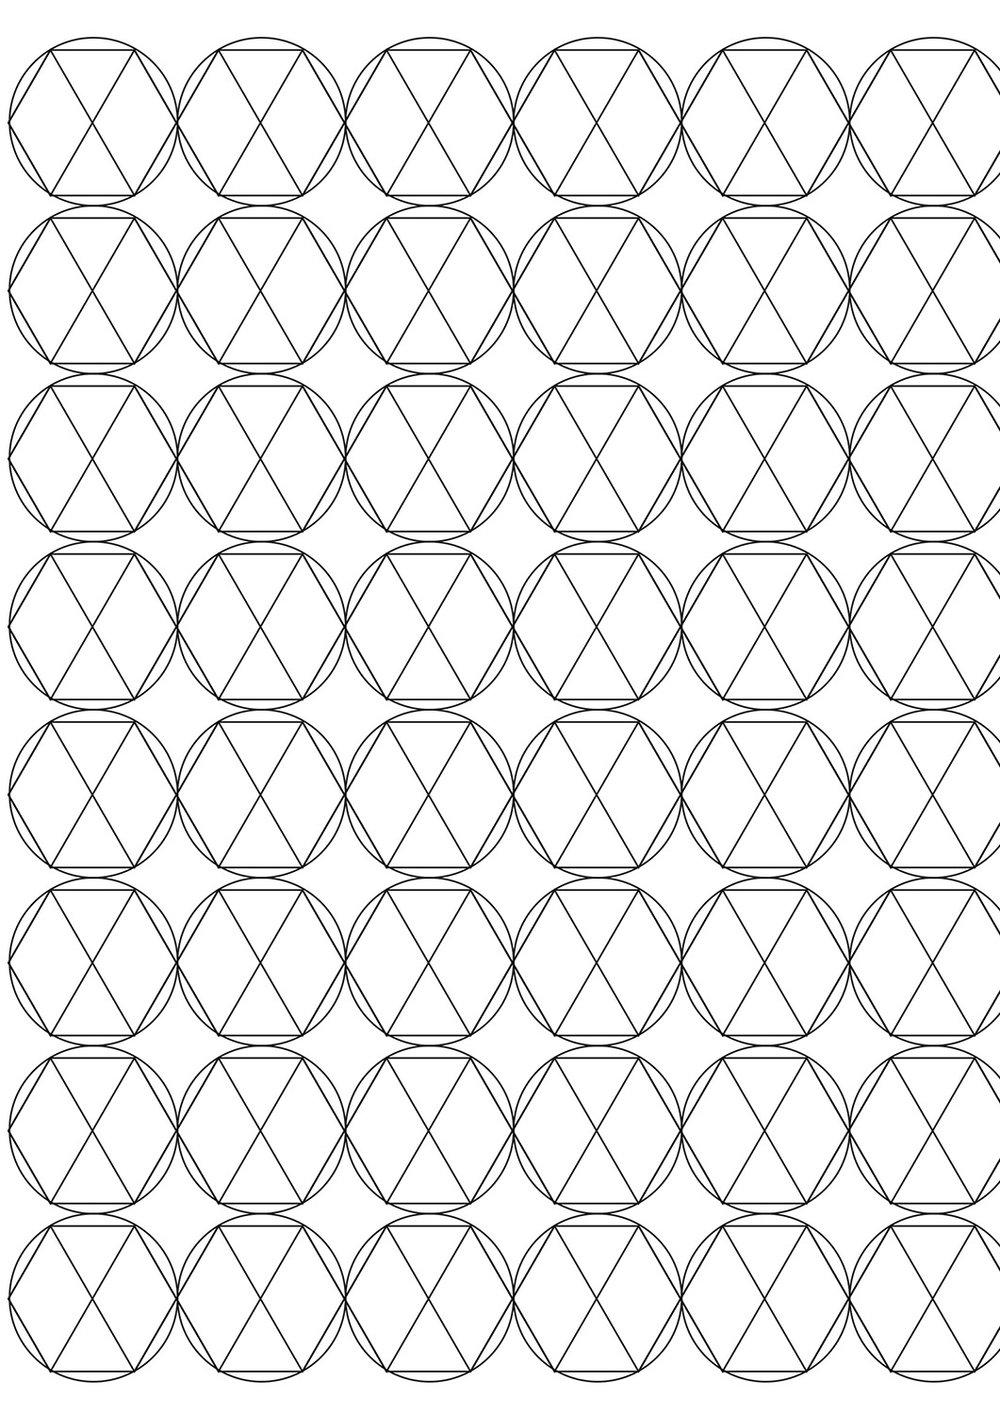 pattern01 11.jpg